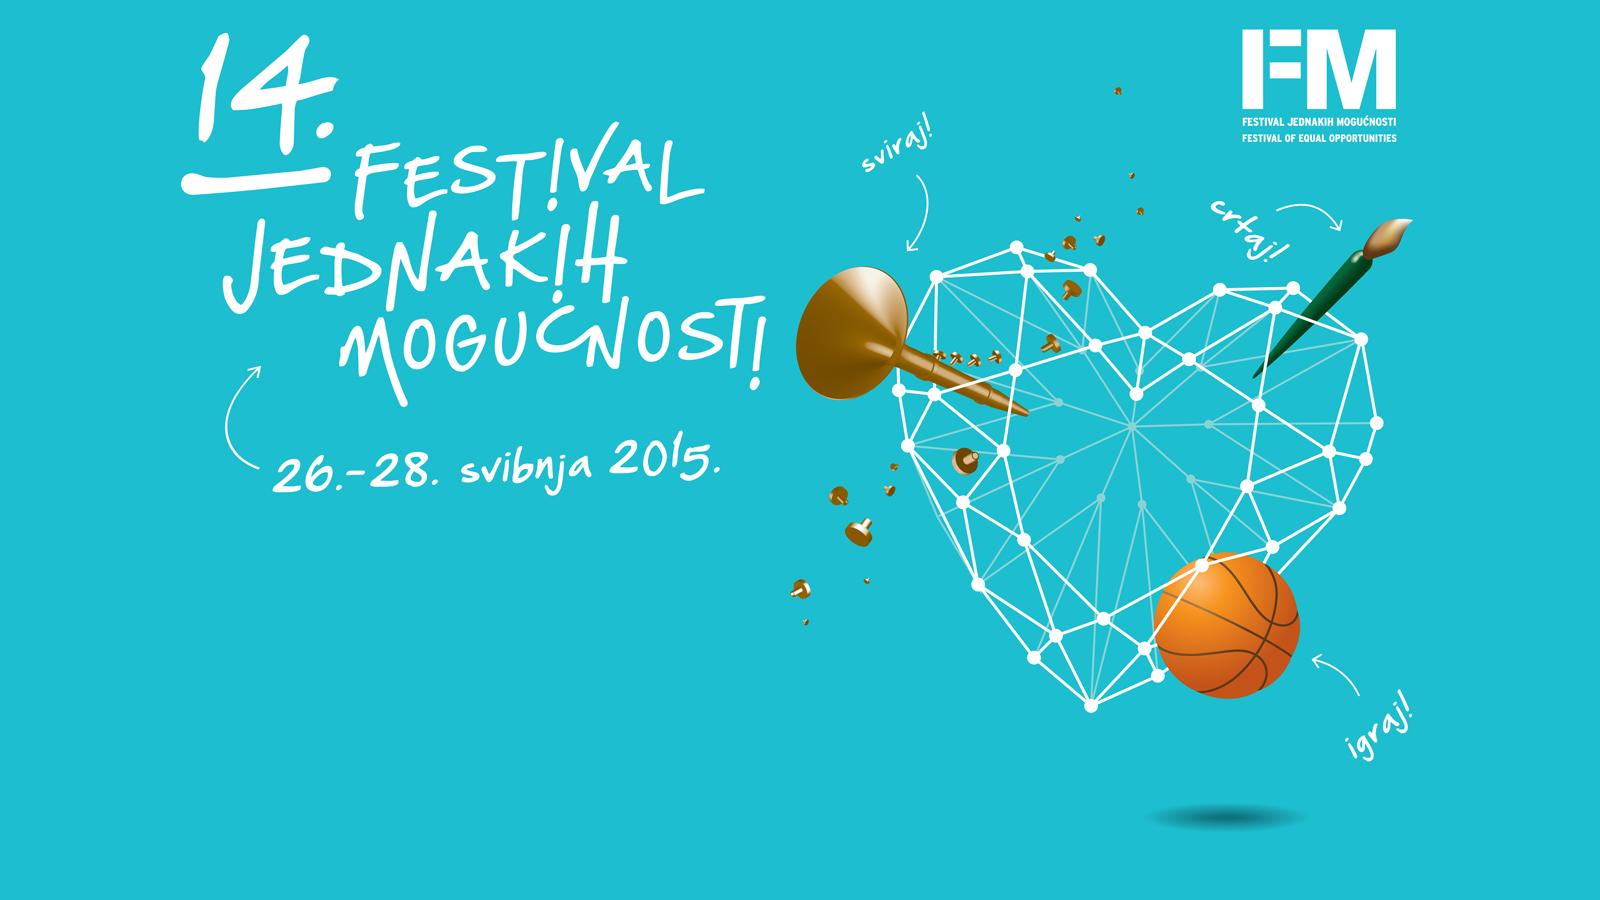 festival_jednakih_mogucnosti_14FM-wallpaper-1600x900